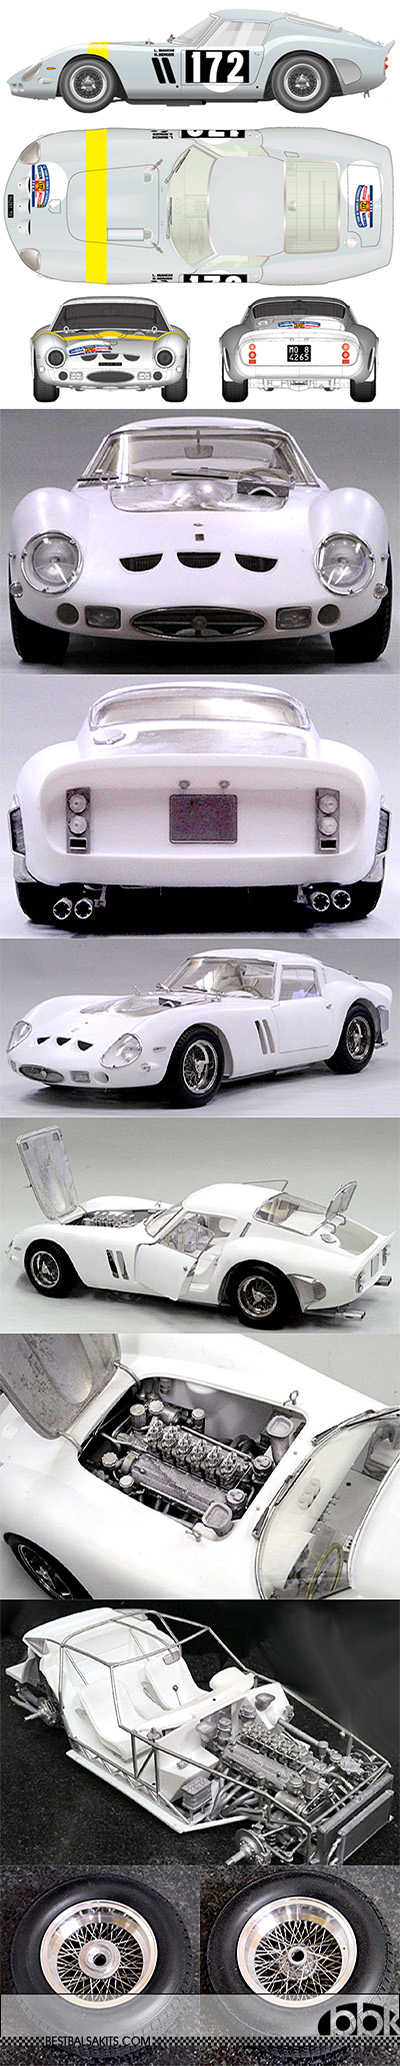 HIRO 1/12 FERRARI GTO250 1964 TOUR DE FRANCE #172 BI